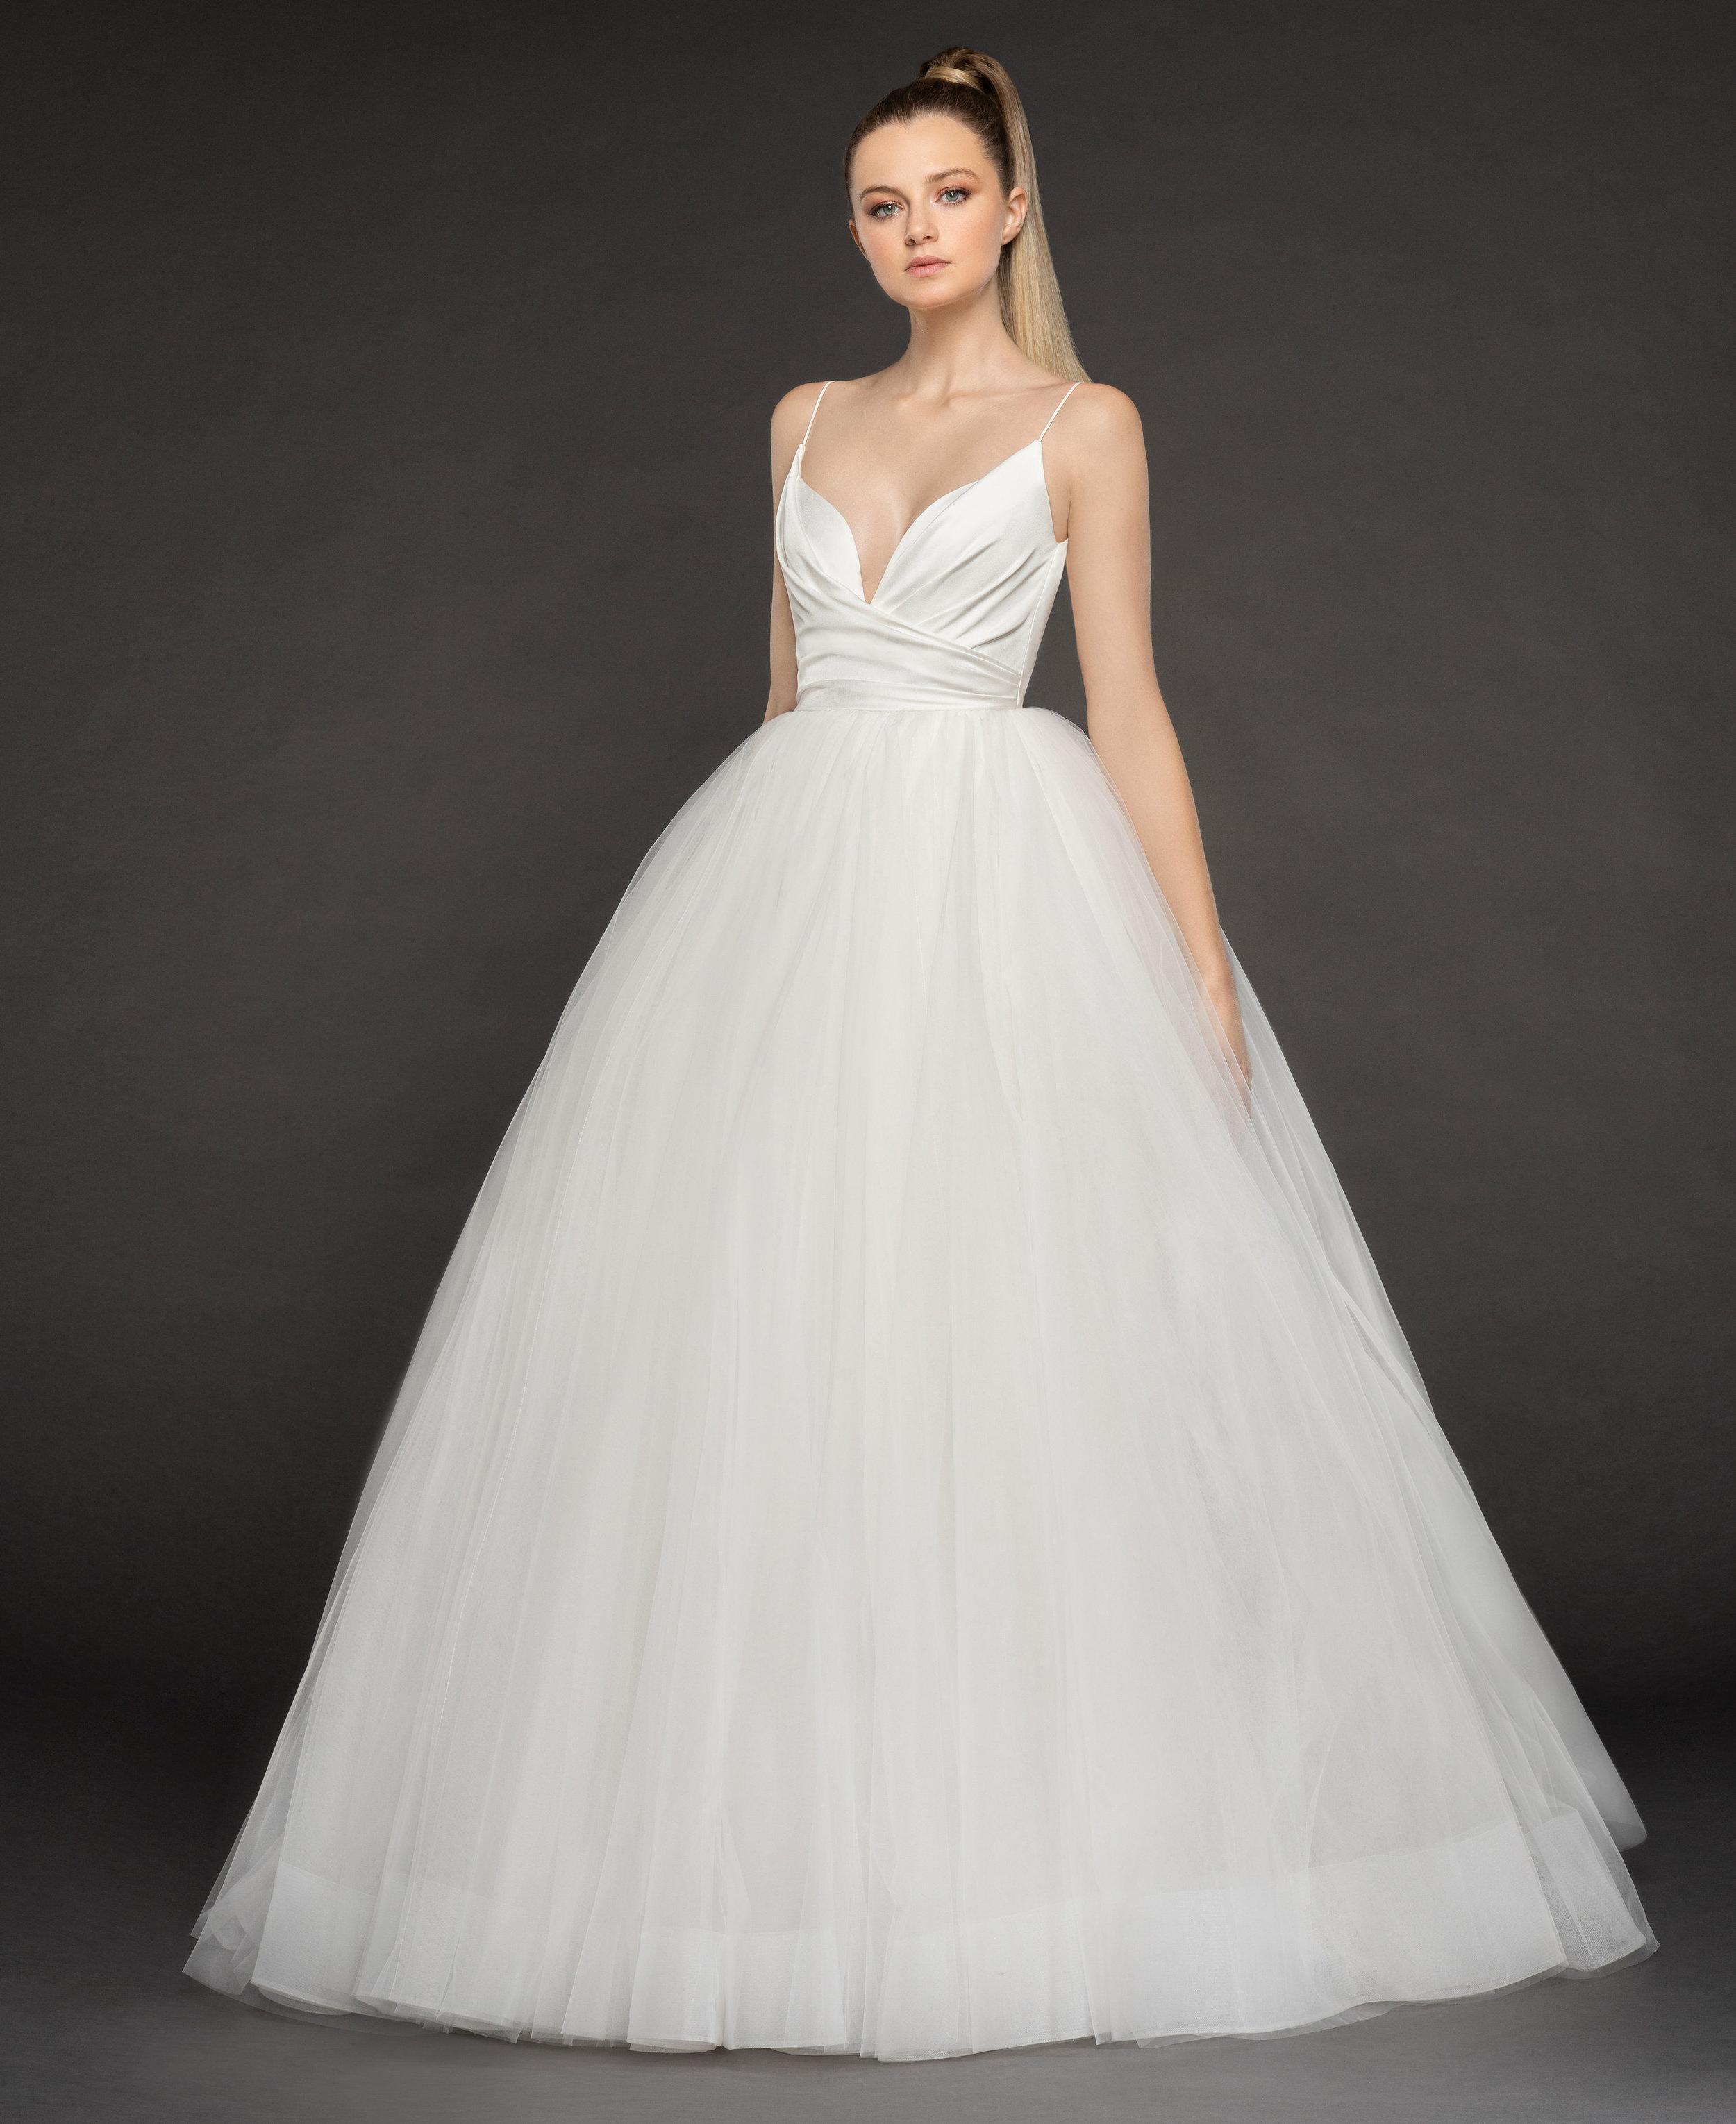 blush-hayley-paige-bridal-fall-2018-style-1856-olympia_0.jpg